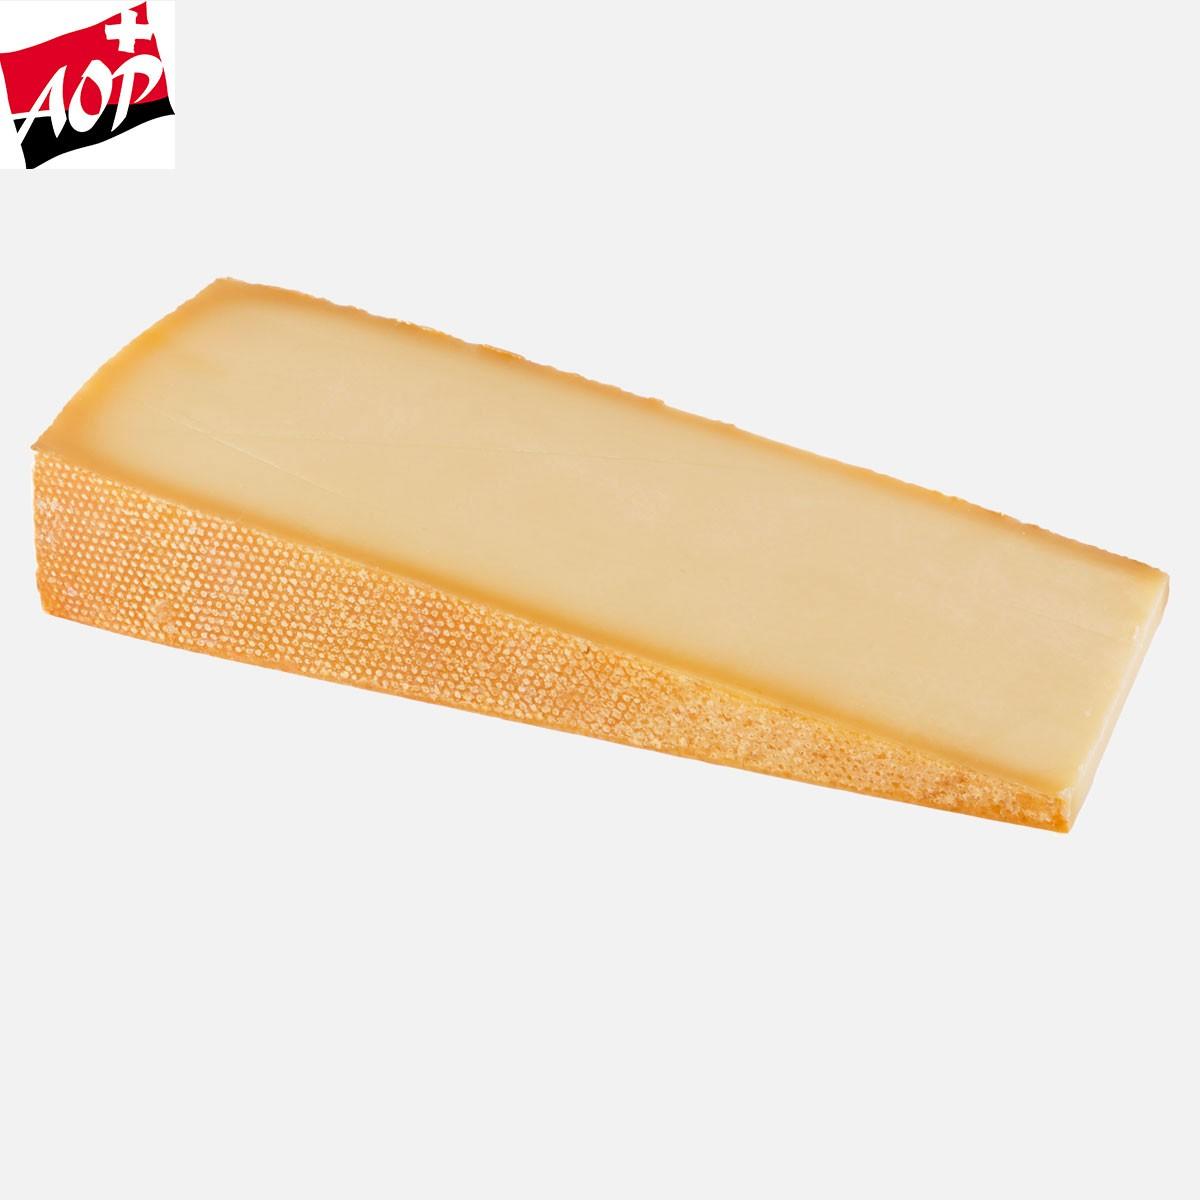 IL GRUYERE AOP dolce 300g